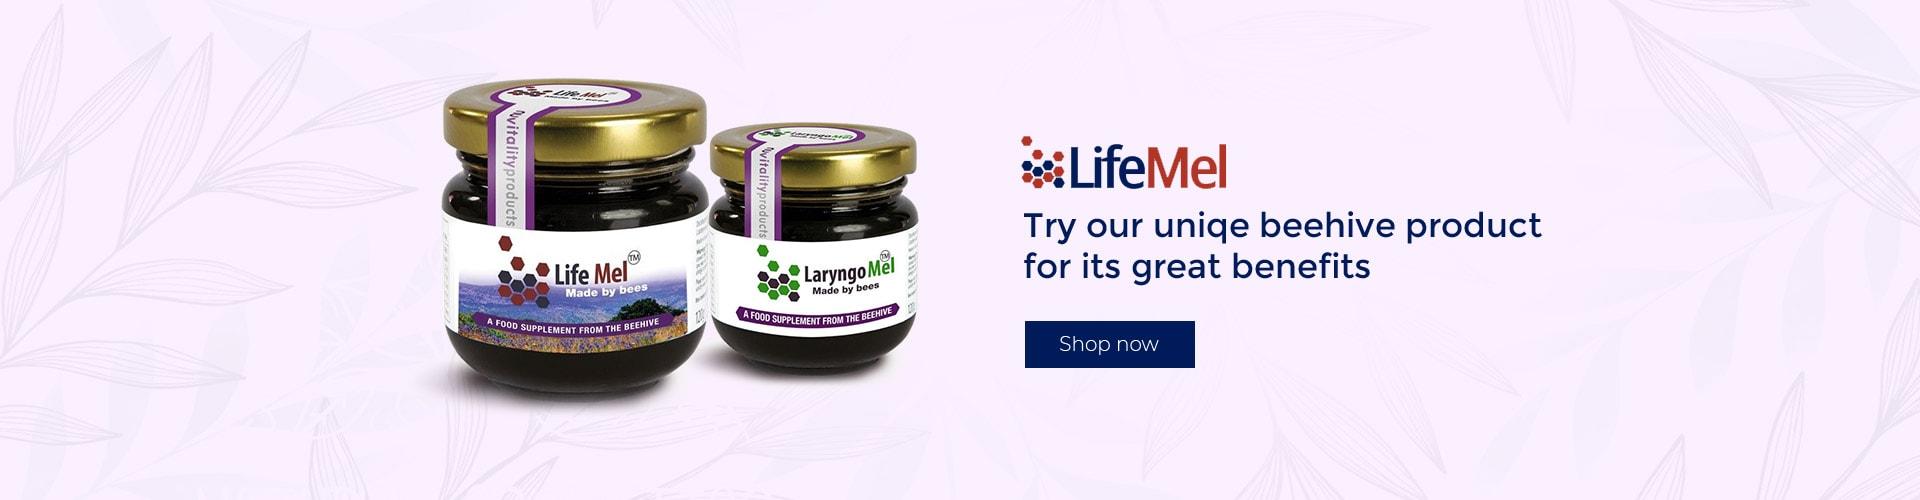 life mel range offers @ nirvana